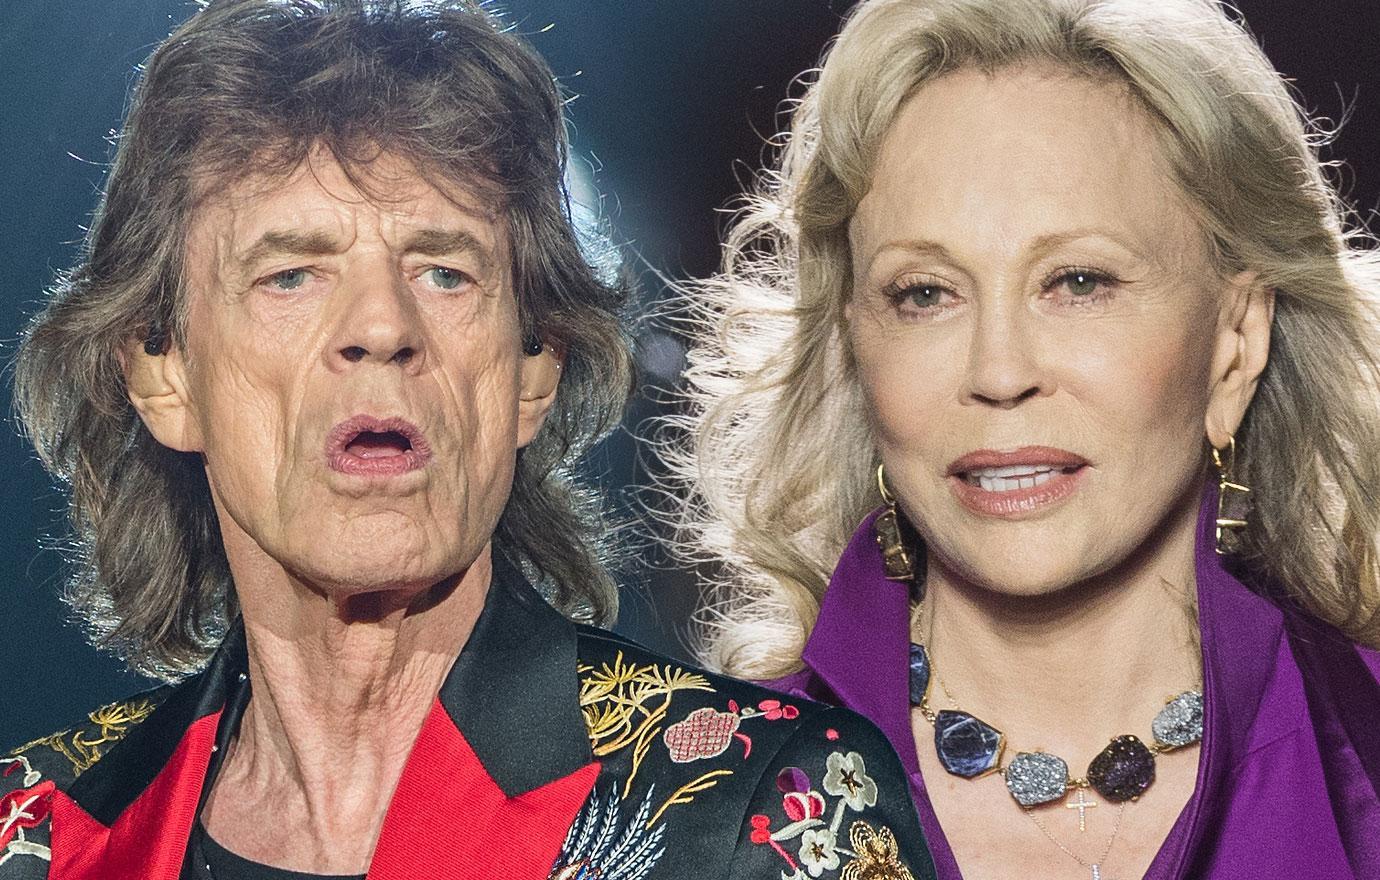 Faye Dunaway Saved Mick Jagger After Drugs Binge